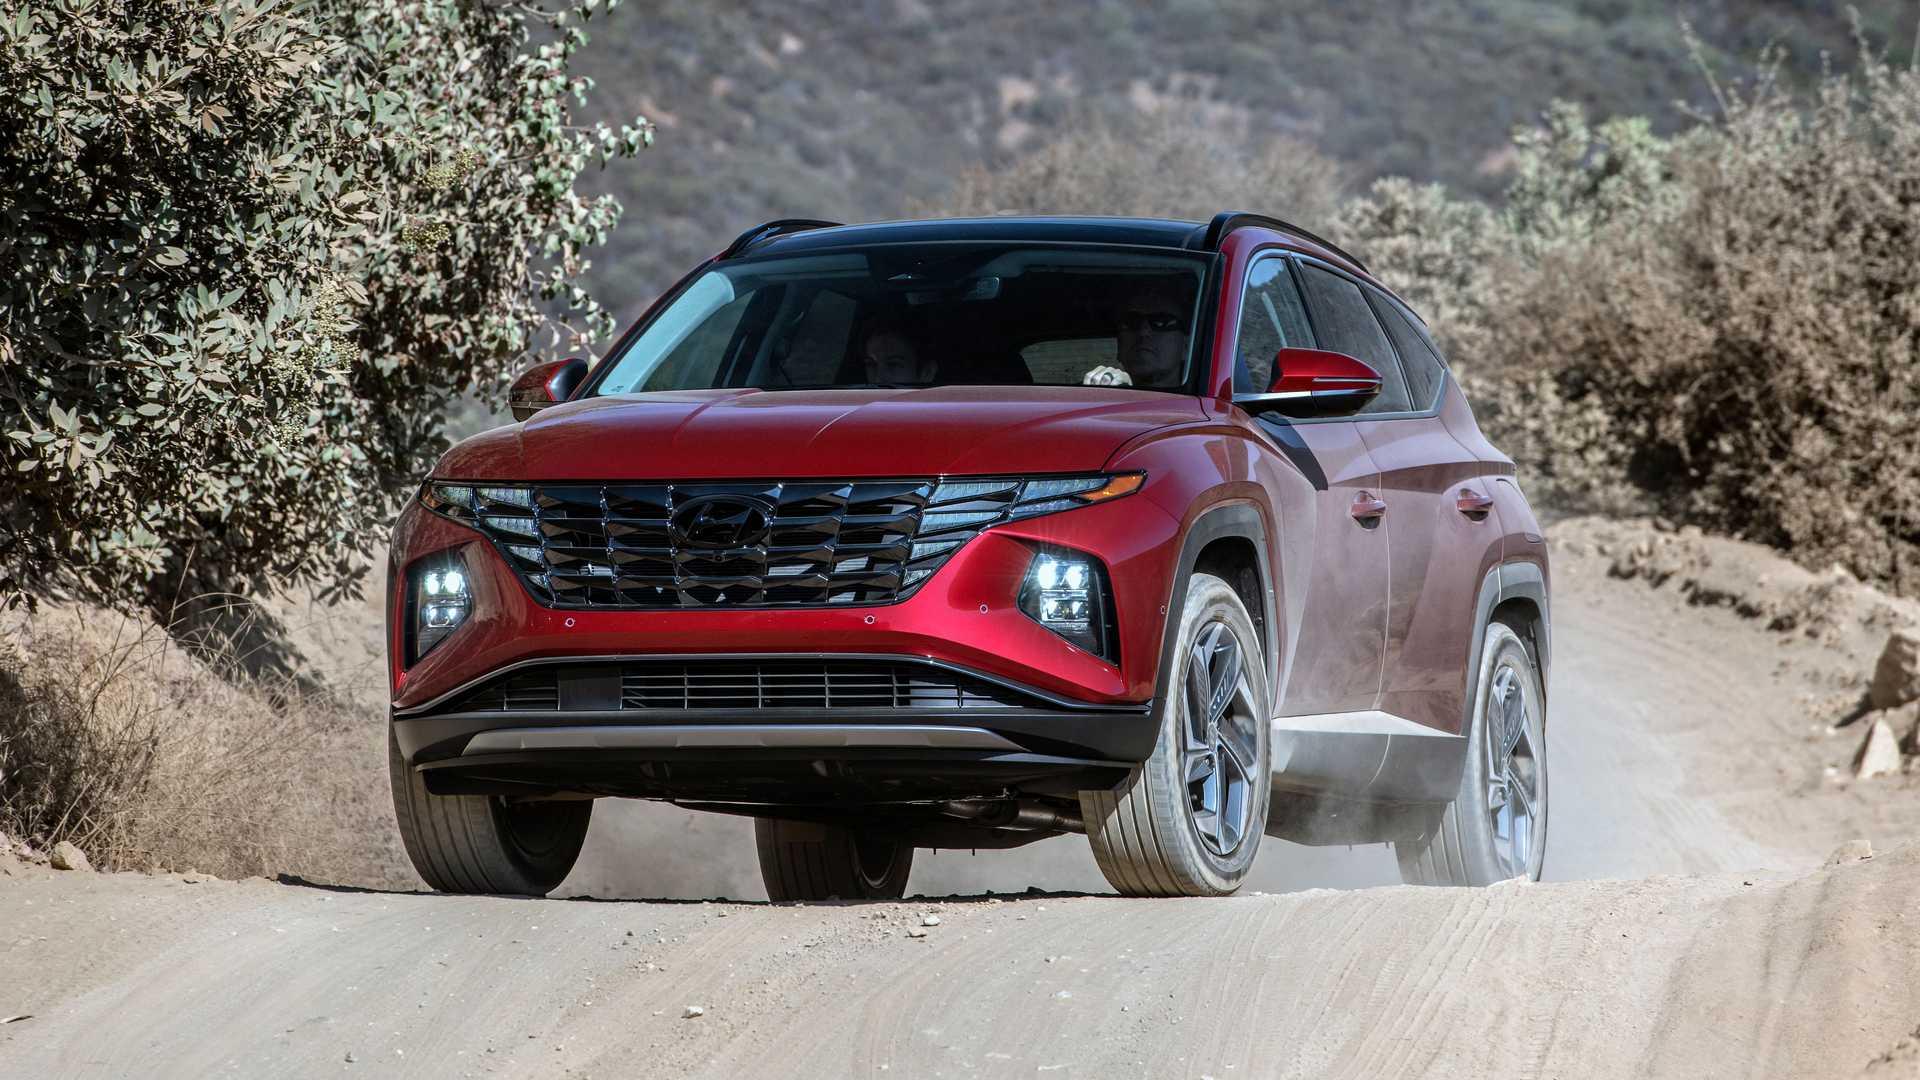 The All New US-Spec Hyundai Tucson Unveiled 4